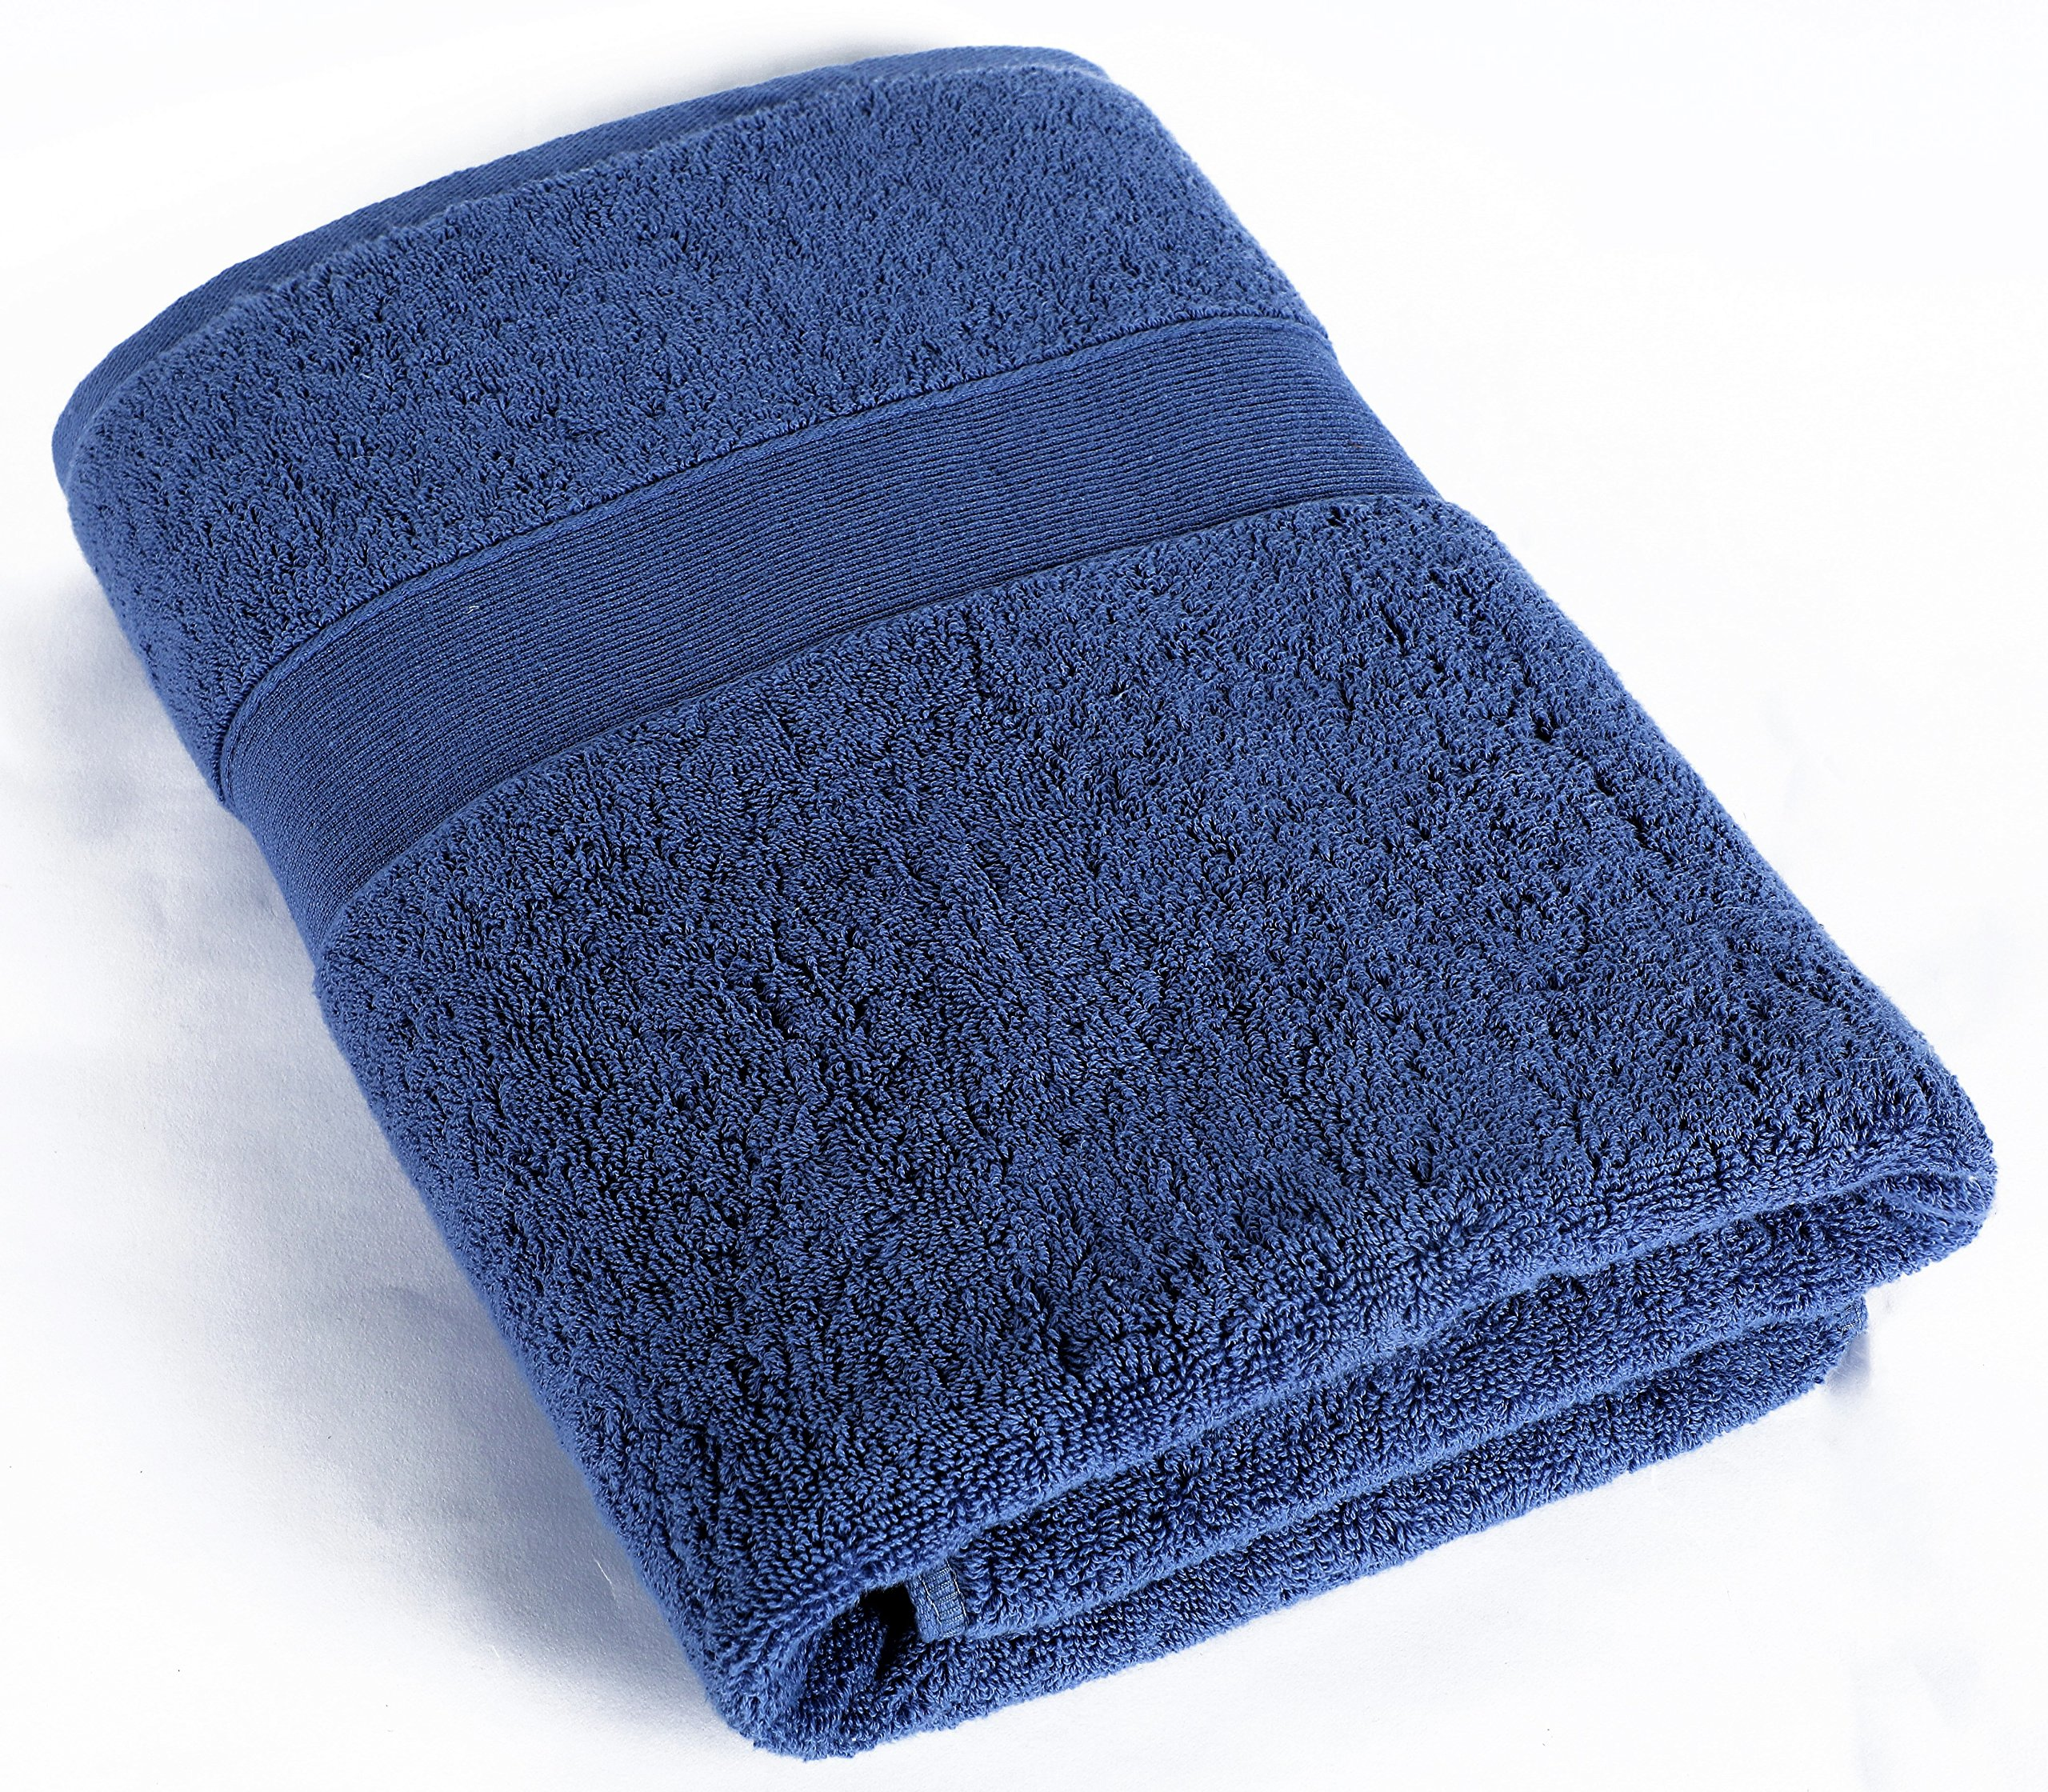 Grohome Cotton Luxury Hotel & Spa 750 GSM Bath Towel Navy (28 x 57 inch)